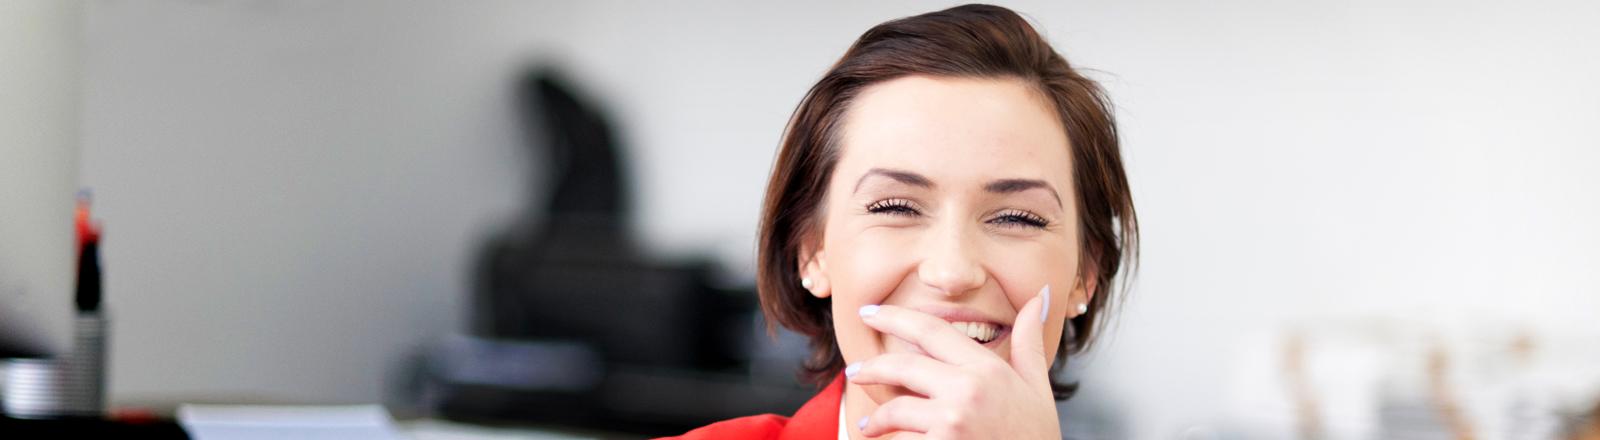 Eine Frau im Businessoutfit lacht